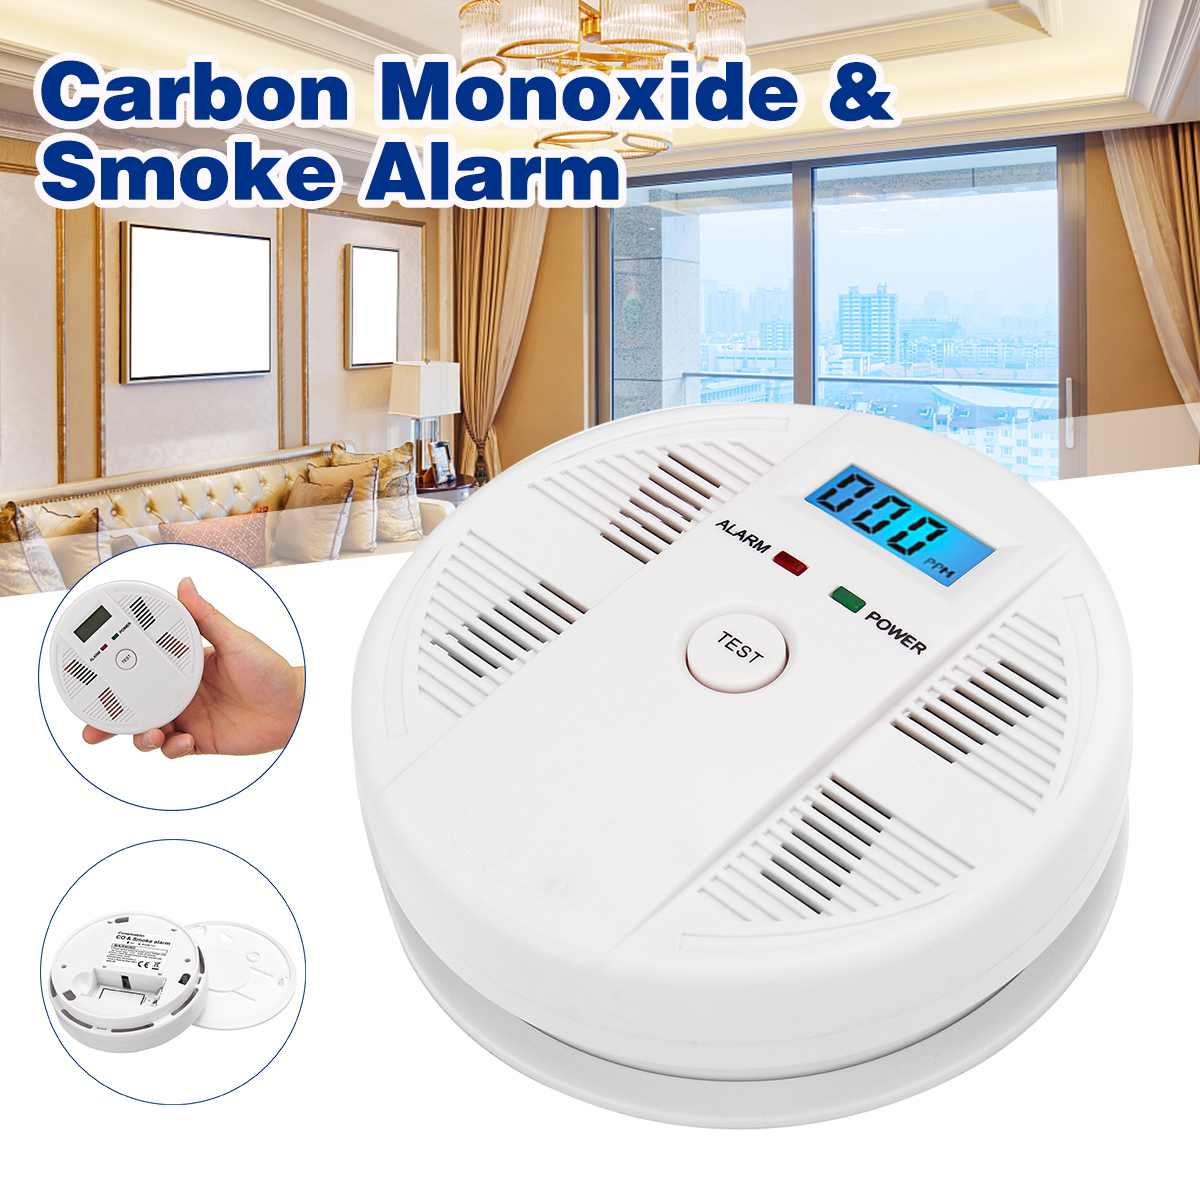 Smoke Carbon monoxide Alarm High Sensitivity Voice Prompts Smoke for Fire Detector/Sensor Low Battery Remind Home Alarm SystemSmoke Carbon monoxide Alarm High Sensitivity Voice Prompts Smoke for Fire Detector/Sensor Low Battery Remind Home Alarm System